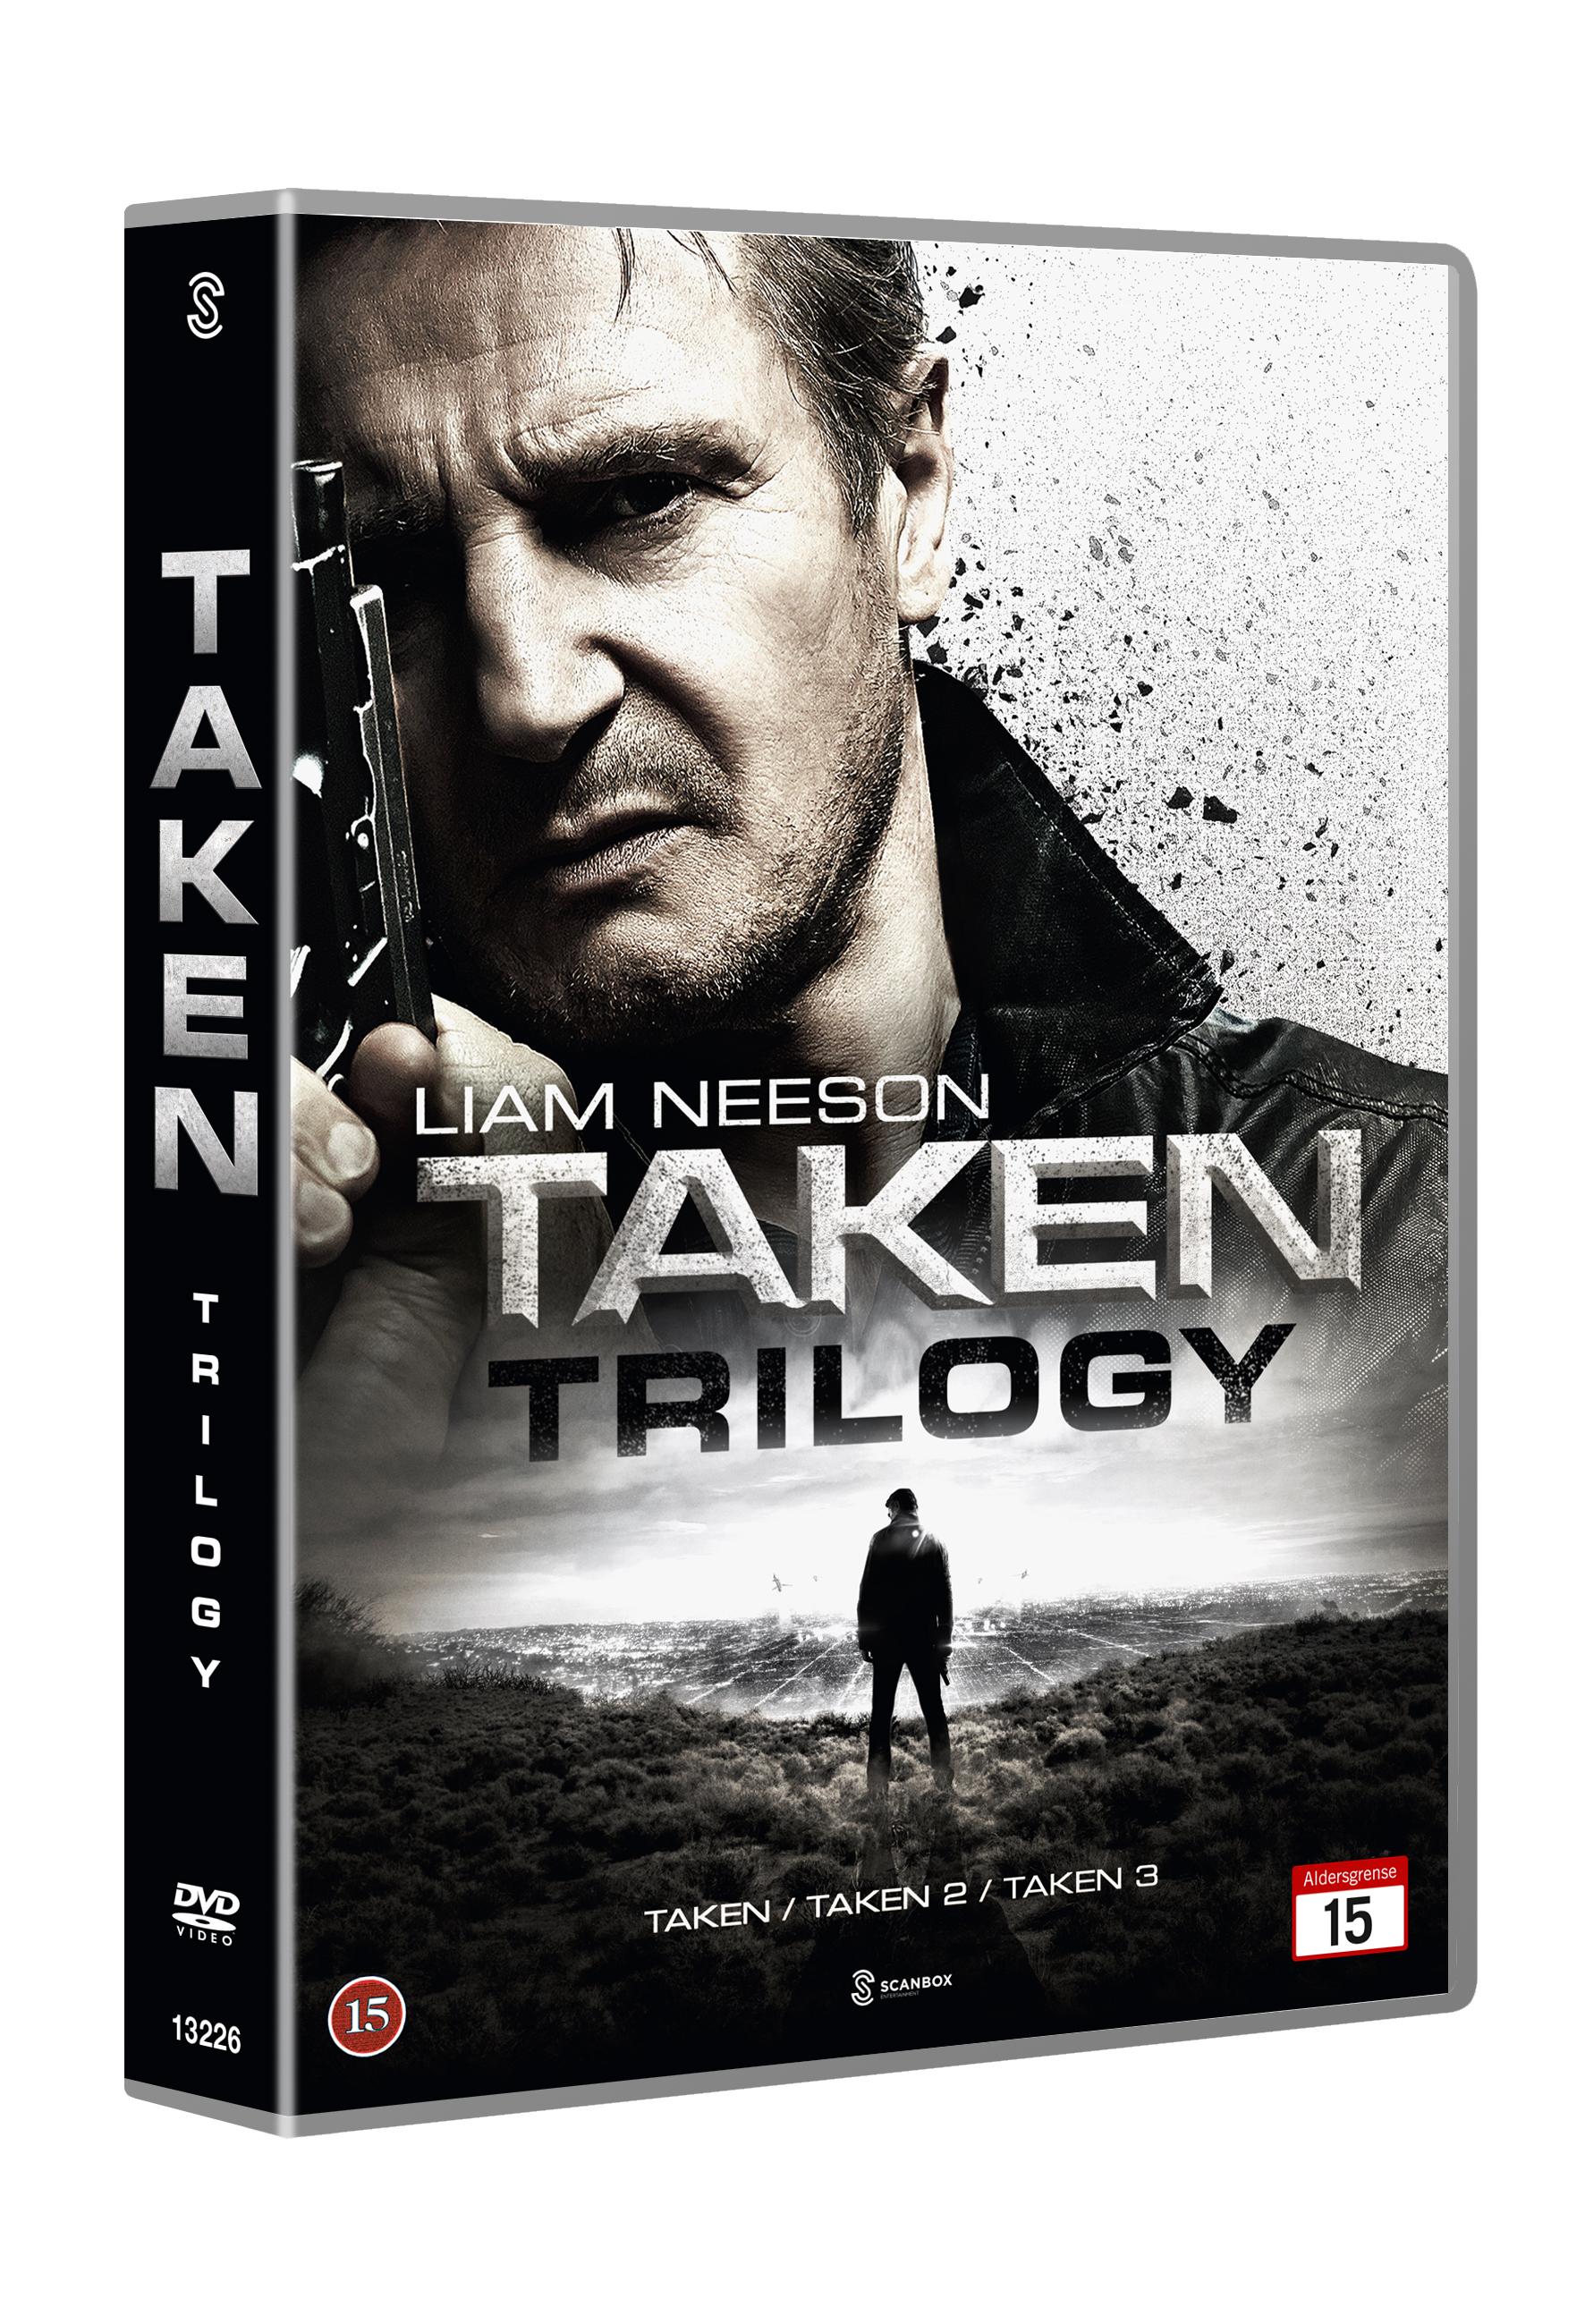 Taken trilogy (1-2-3)